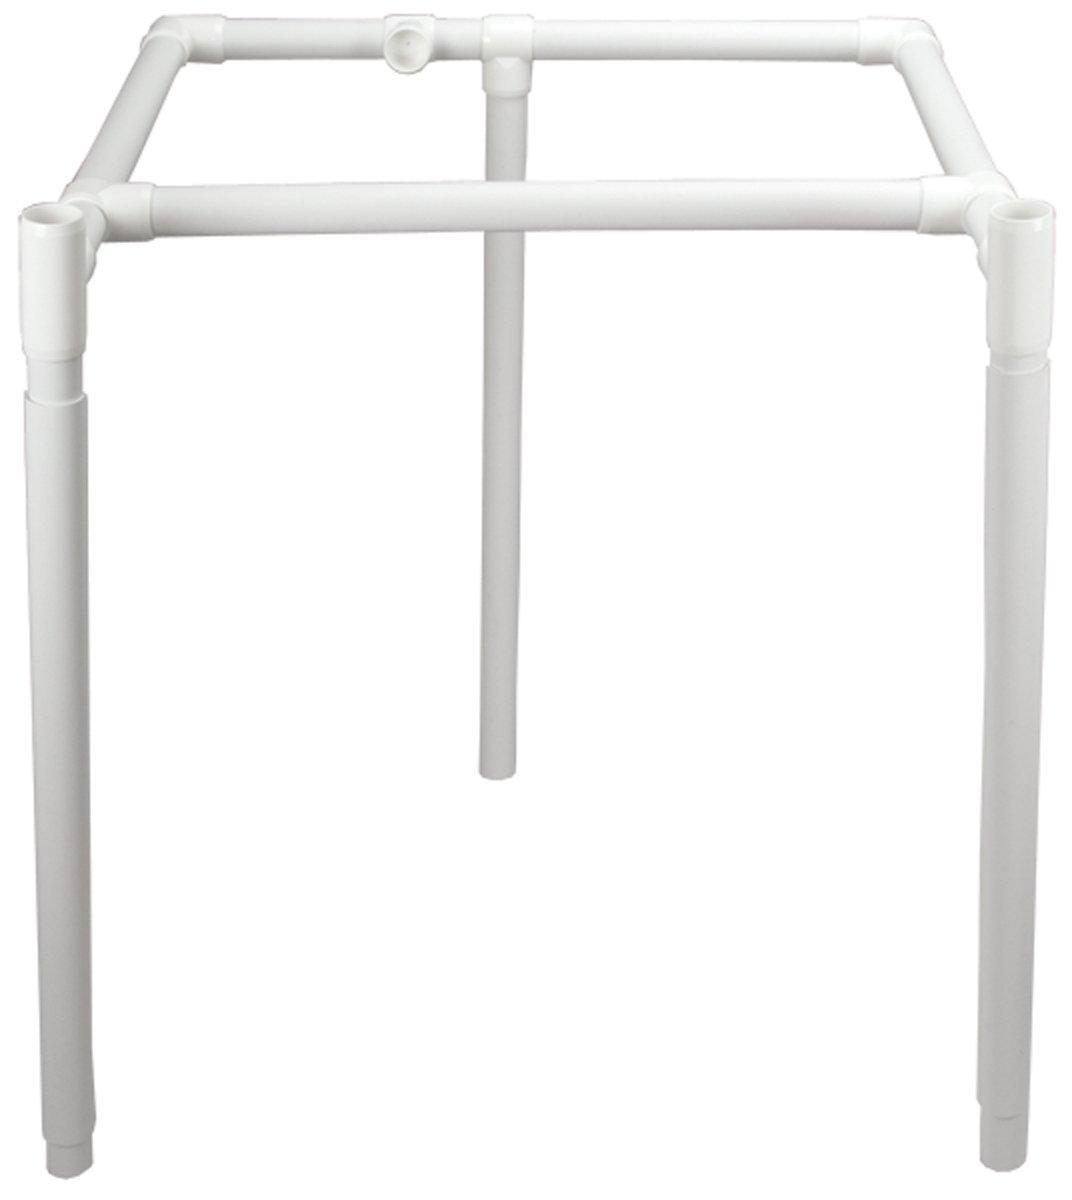 Q-Snap Floor Frame Extension Kit LFEK